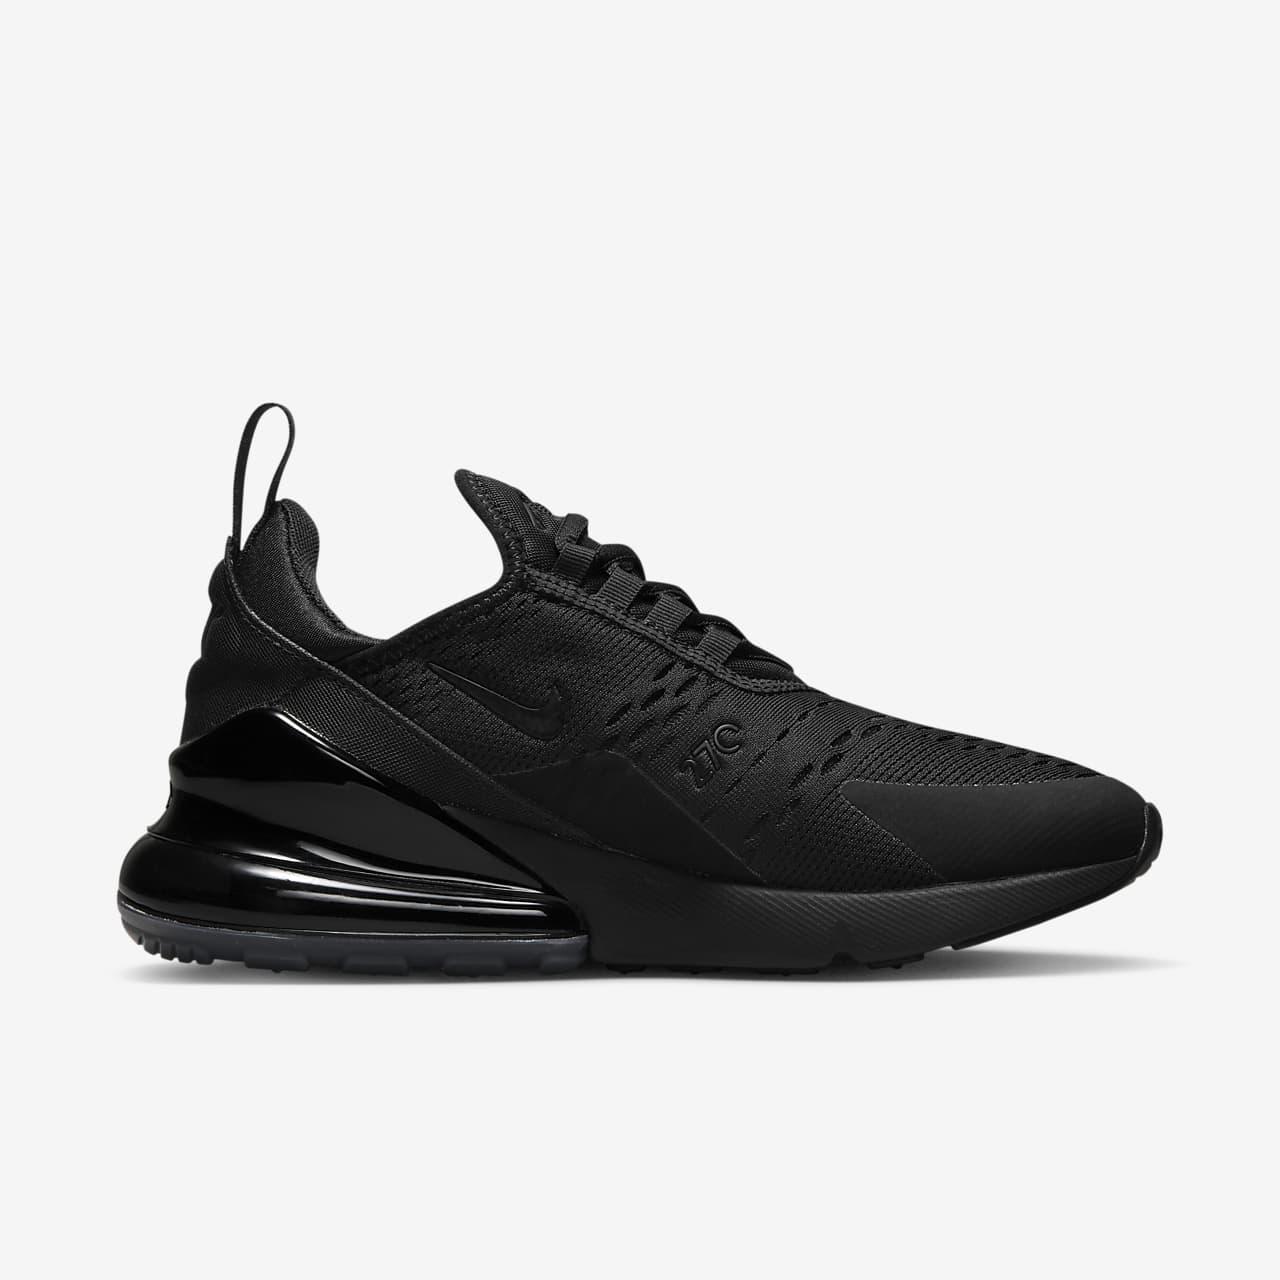 Details about Men's Nike SB Air Max Janoski 2 Shoes BlackWhiteAnthracite Sizes 9 12